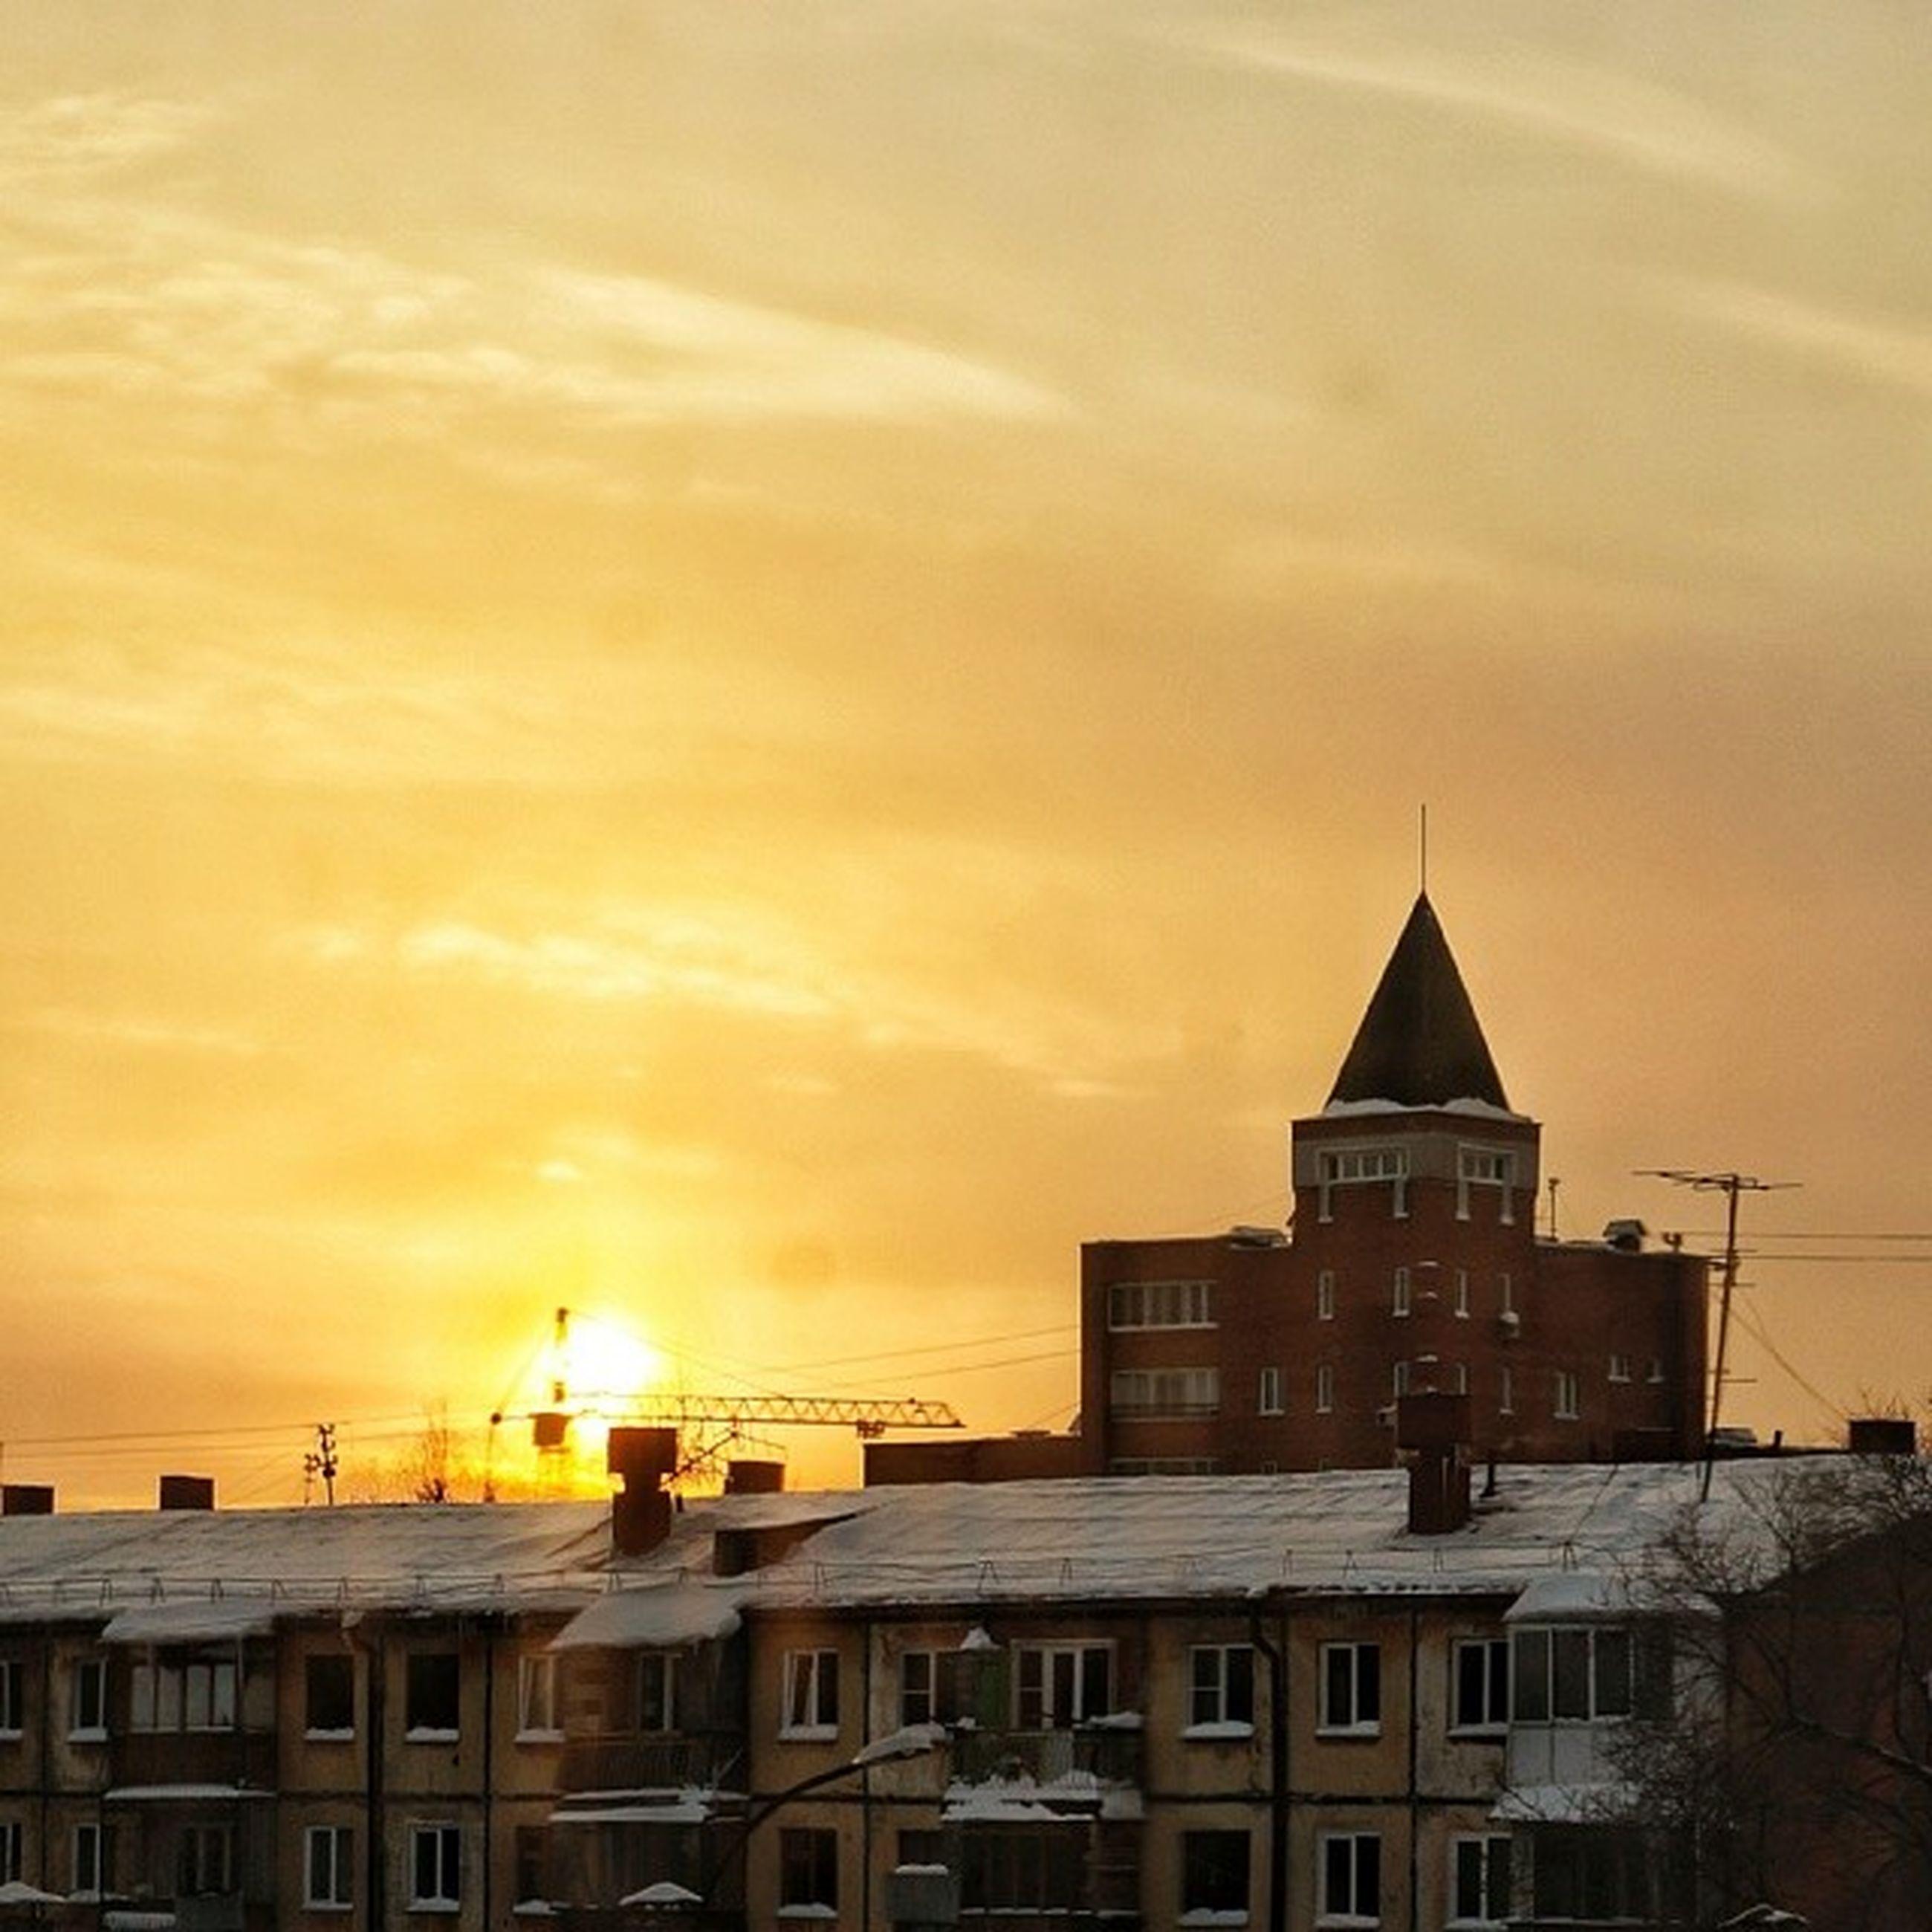 sunset, architecture, building exterior, built structure, orange color, sky, sun, cloud - sky, residential building, building, residential structure, city, house, sunlight, yellow, outdoors, nature, cloud, no people, scenics